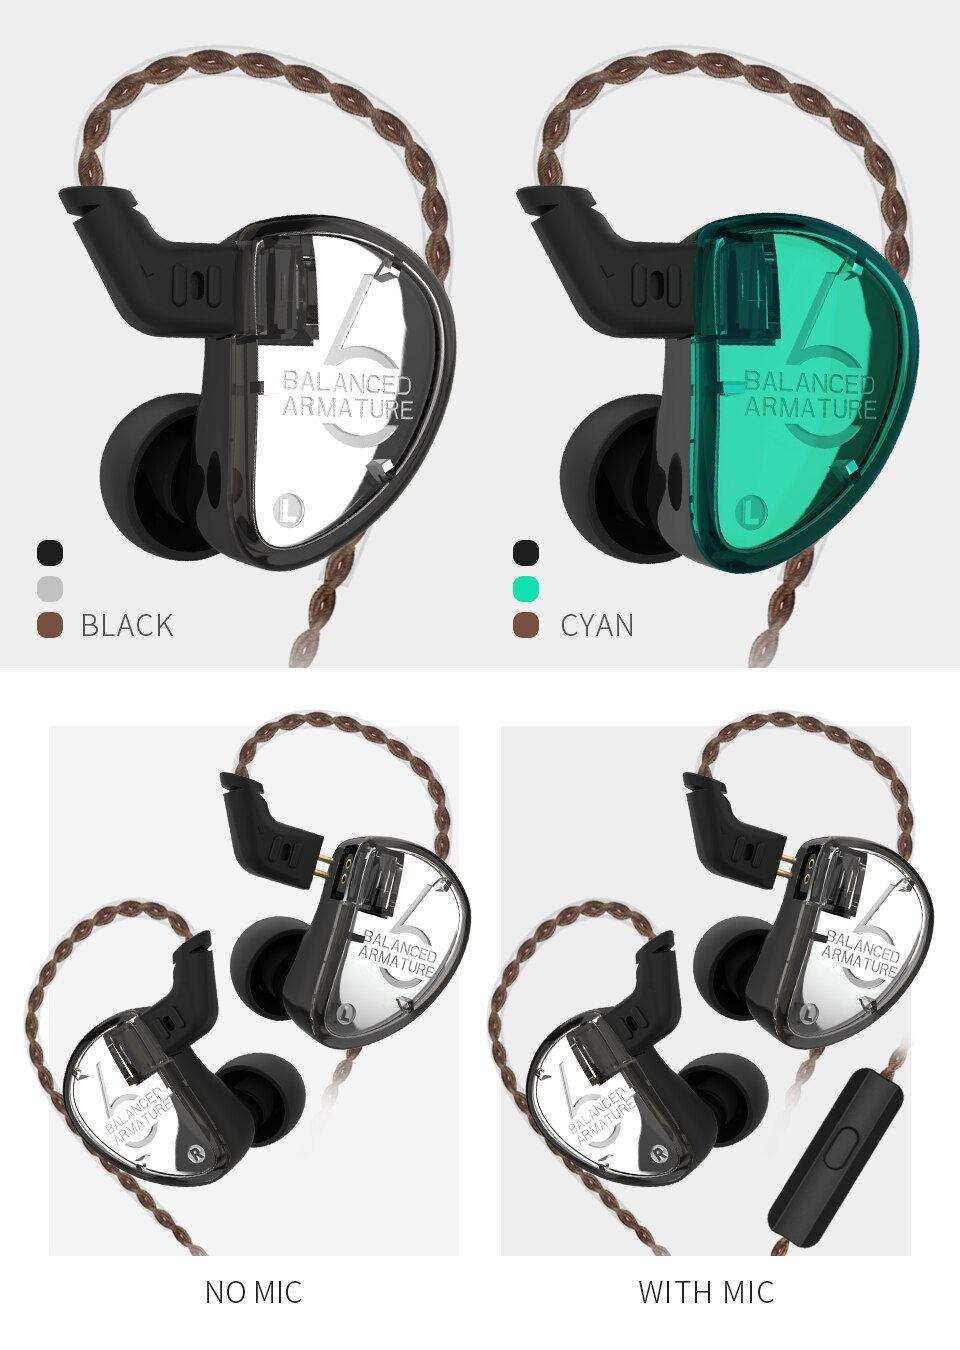 buy kz as06 wired earphones